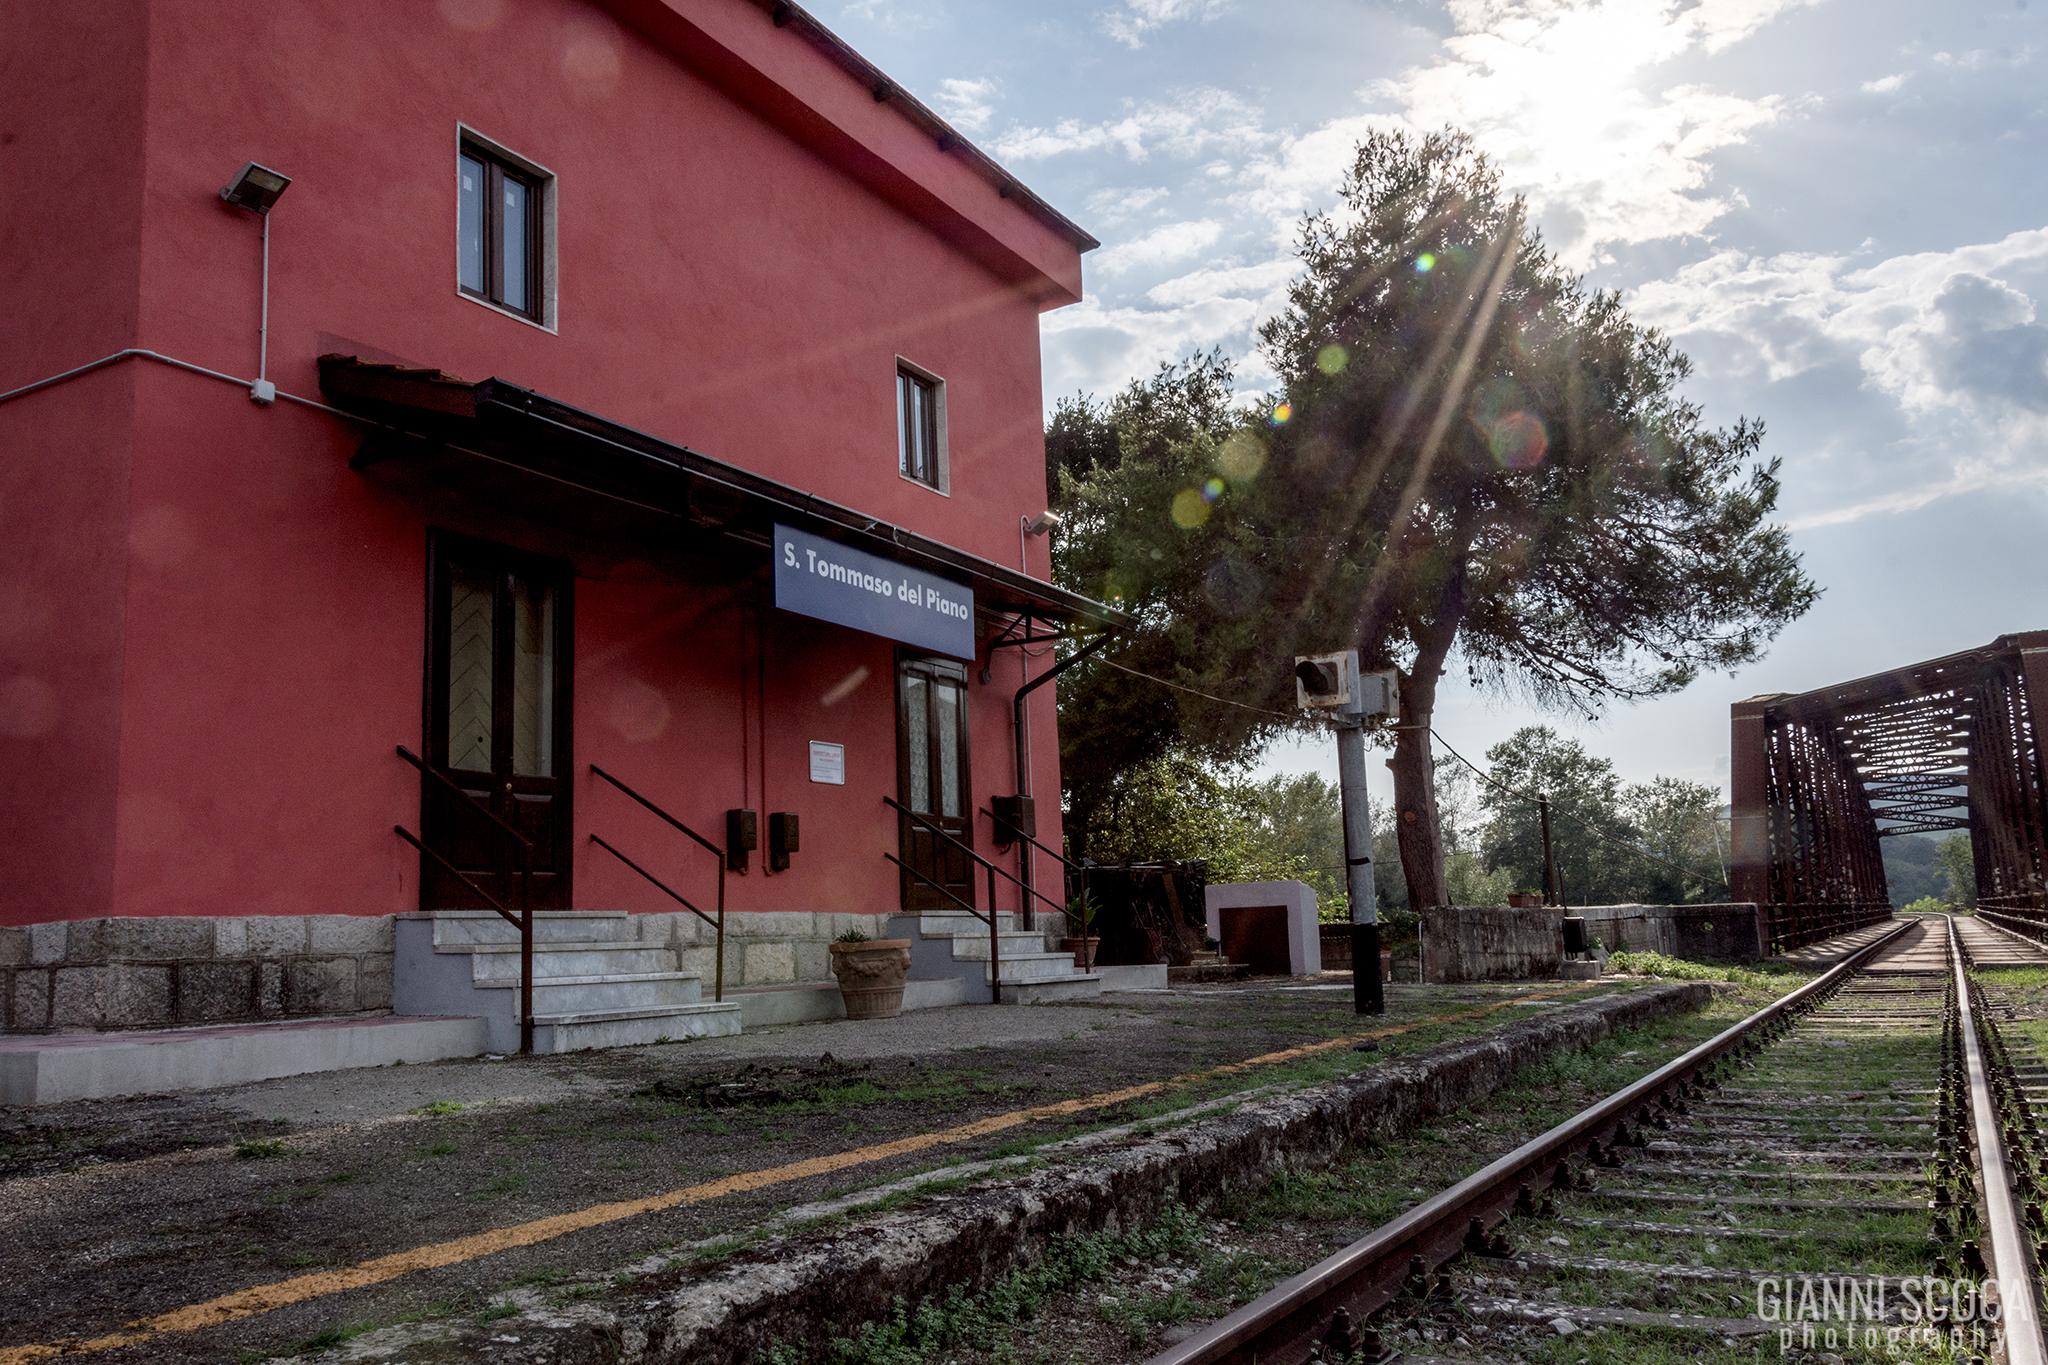 Station St. Thomas...